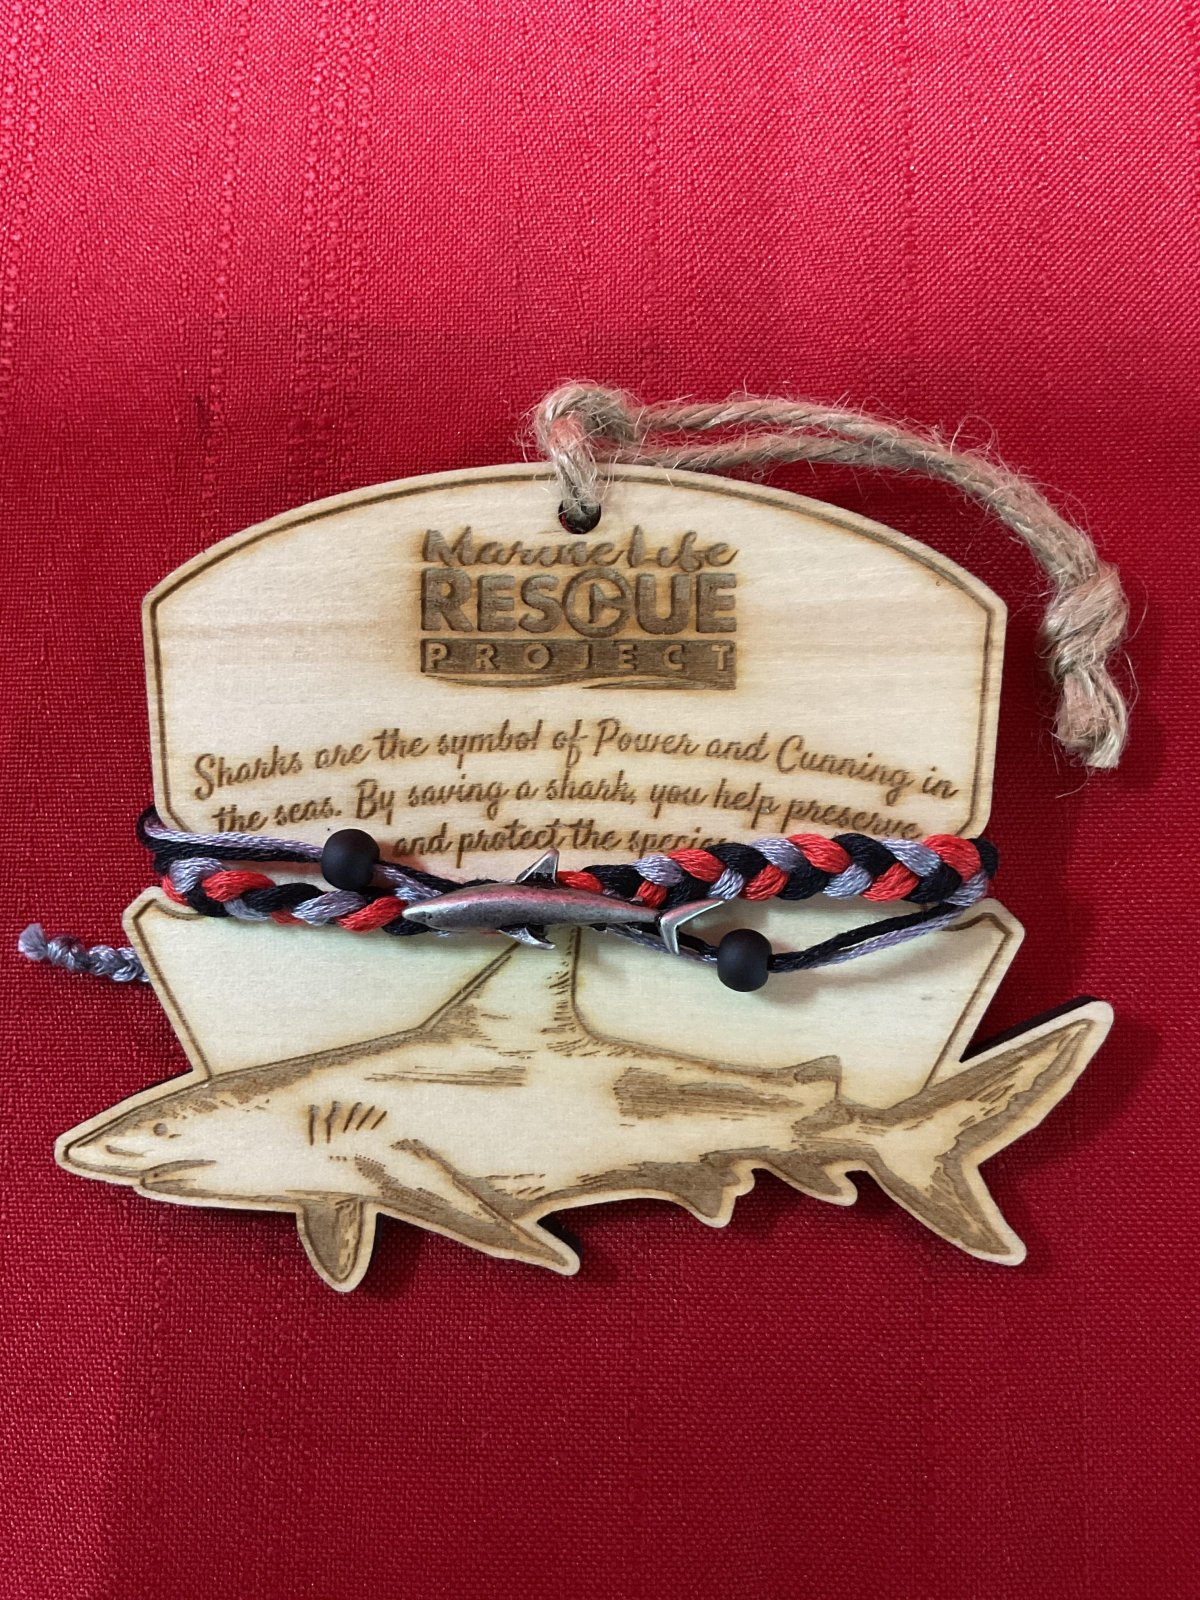 Marine Life Rescue Bracelet w/ Shark Ornament